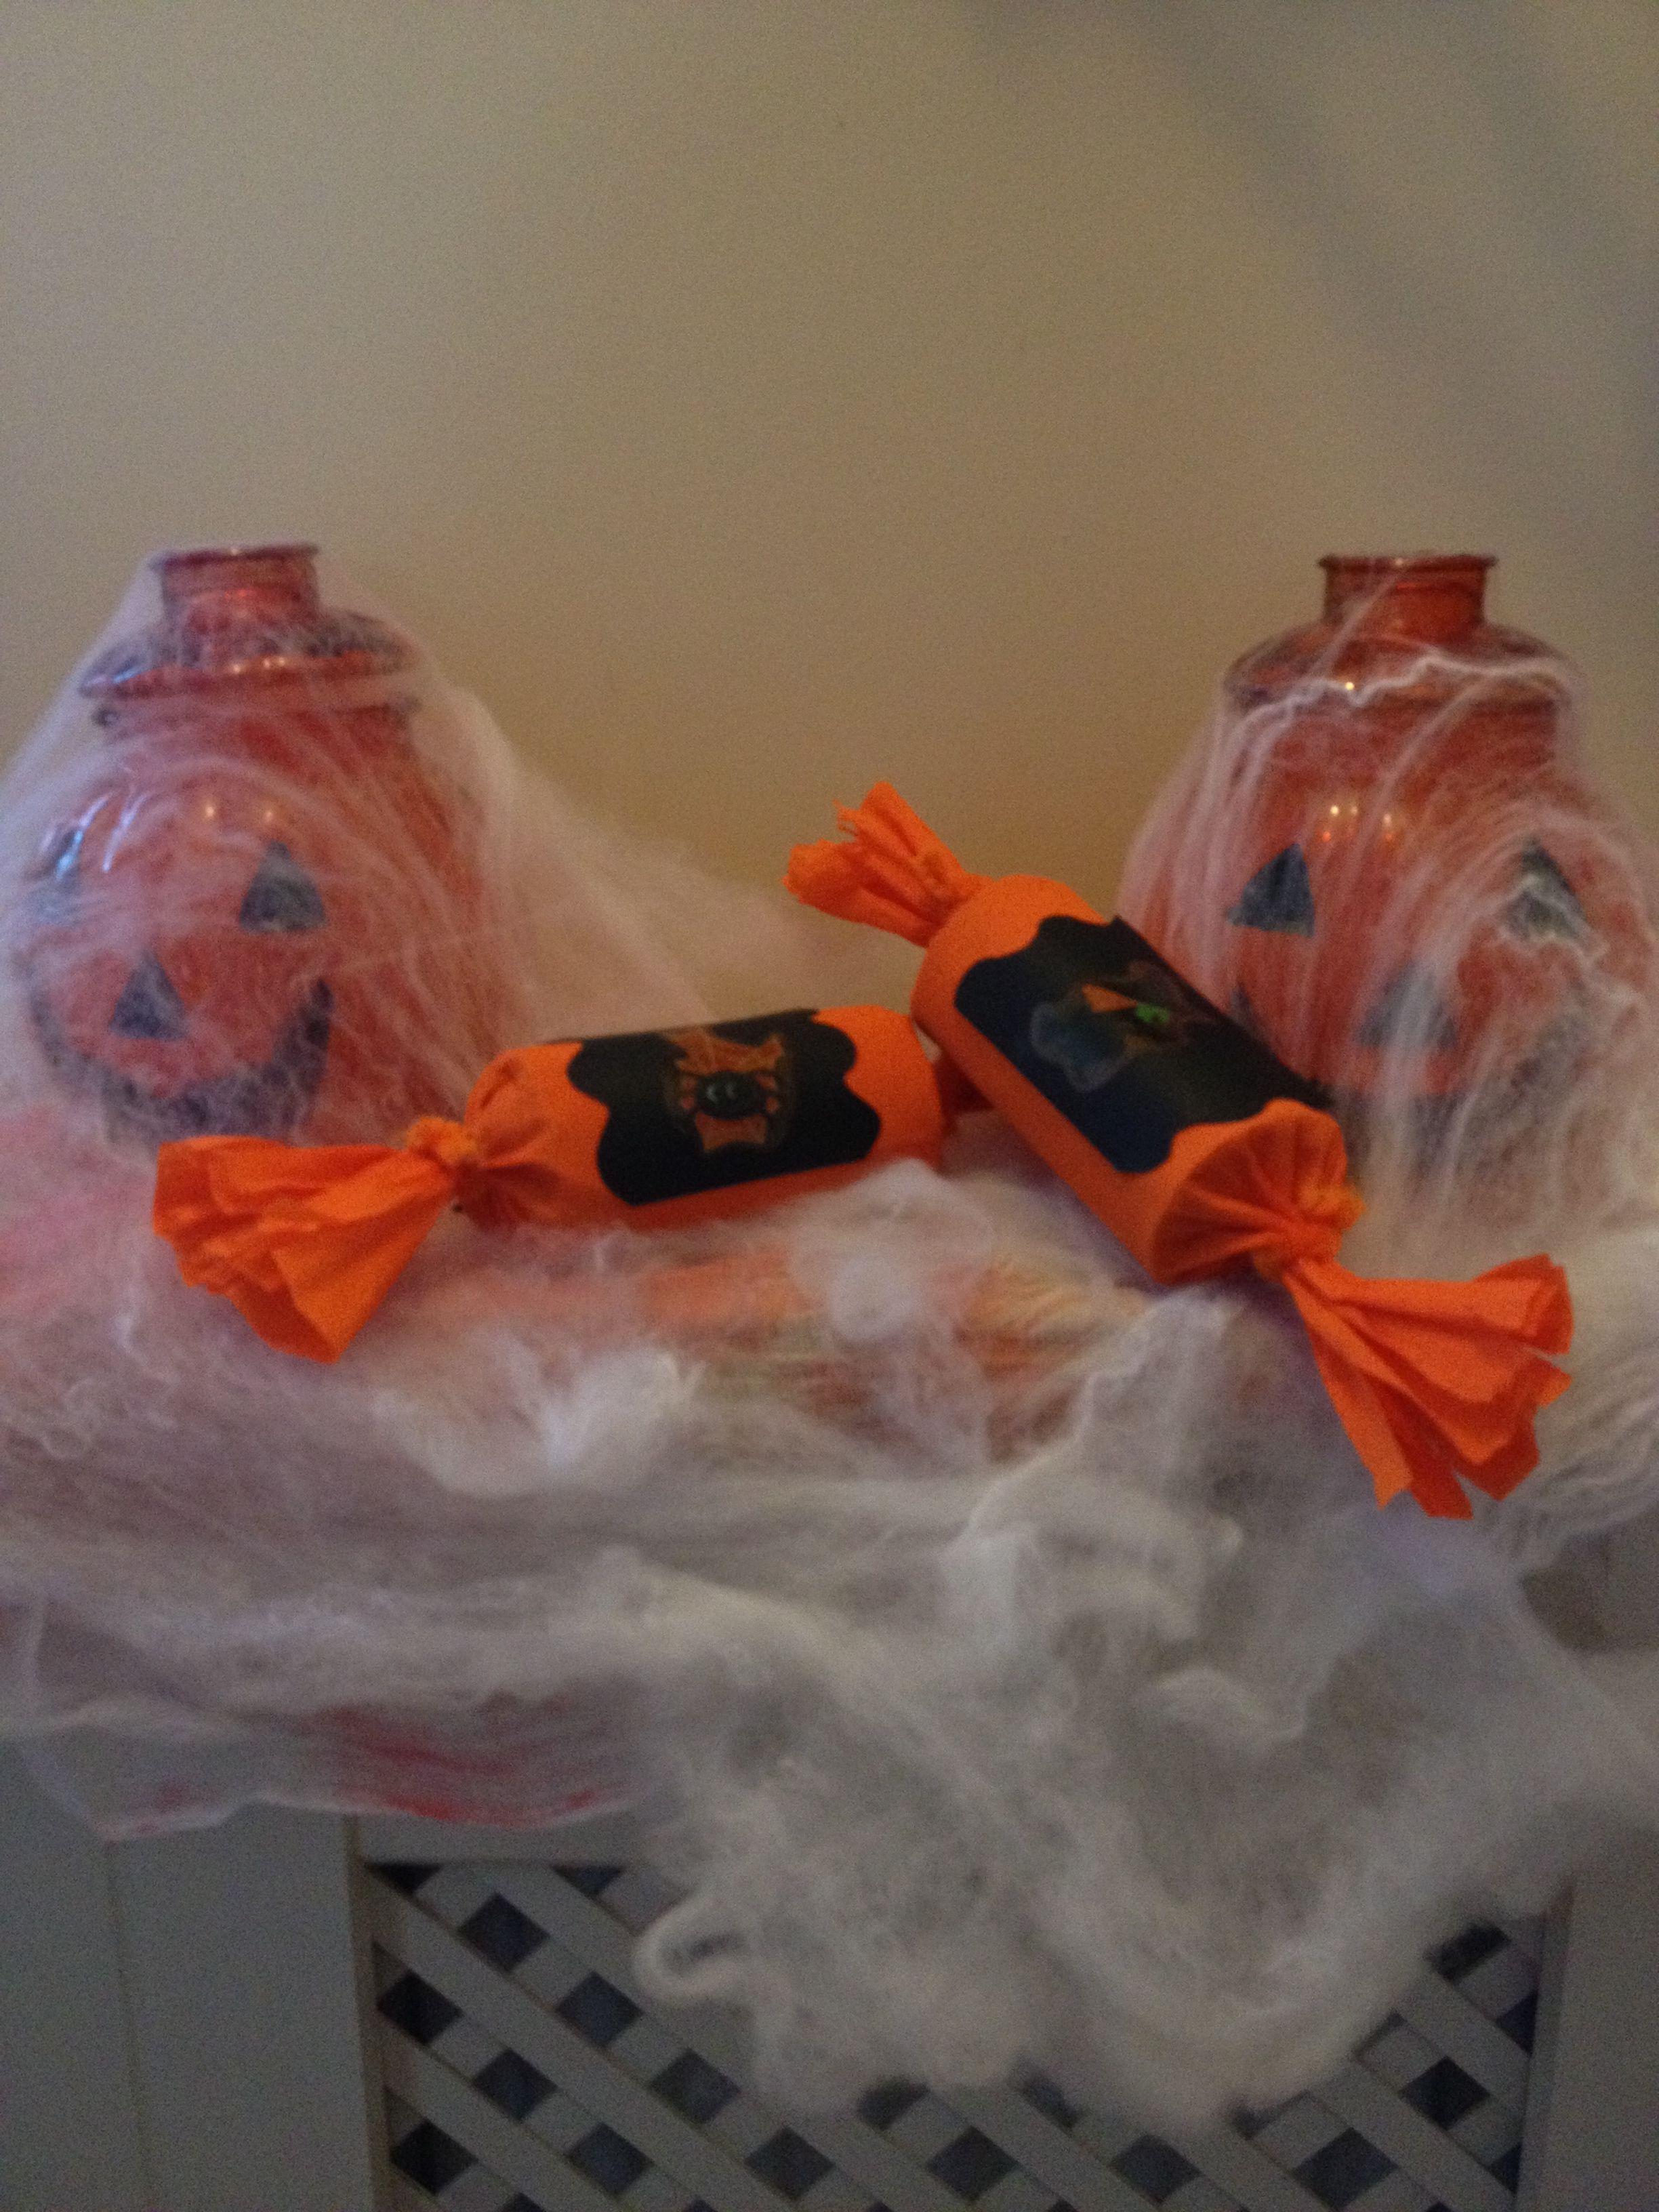 Homemade Halloween crackers